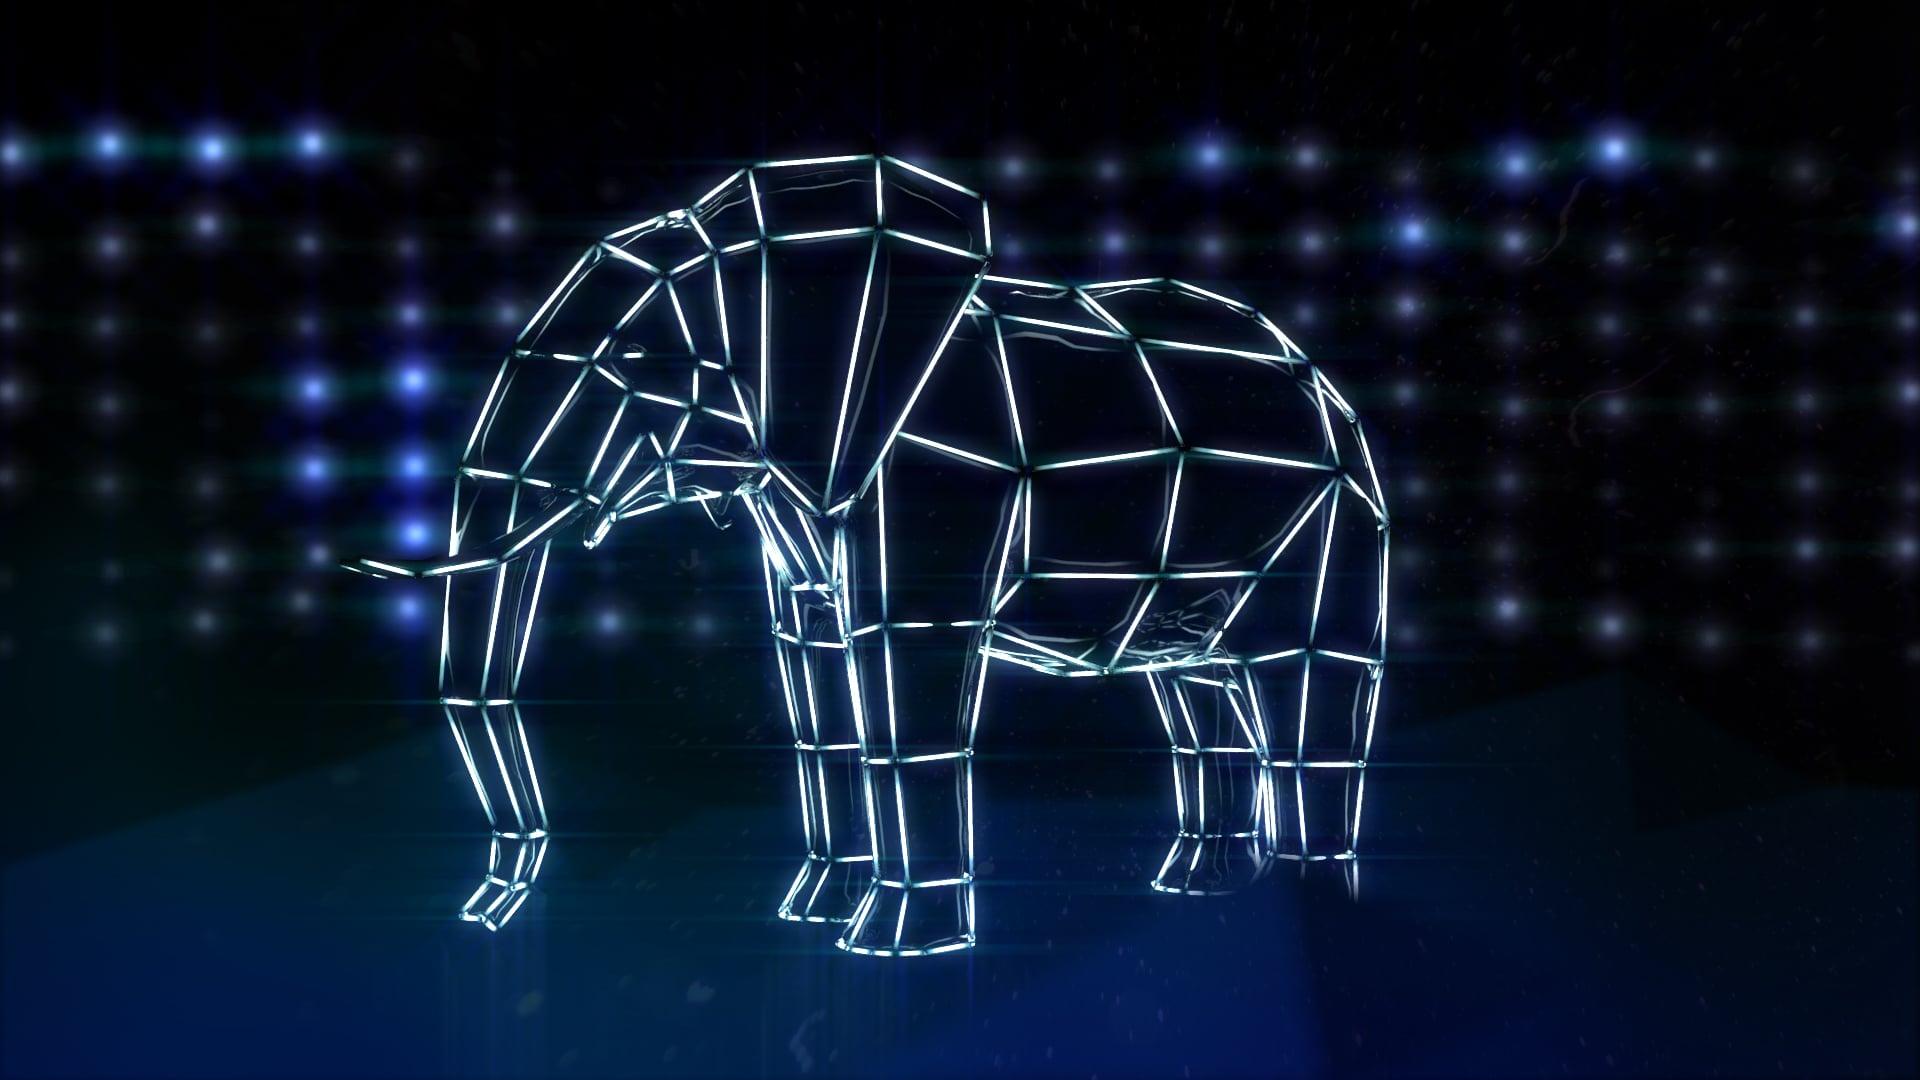 Elephant Light Bar Zoo Lights Concept 1